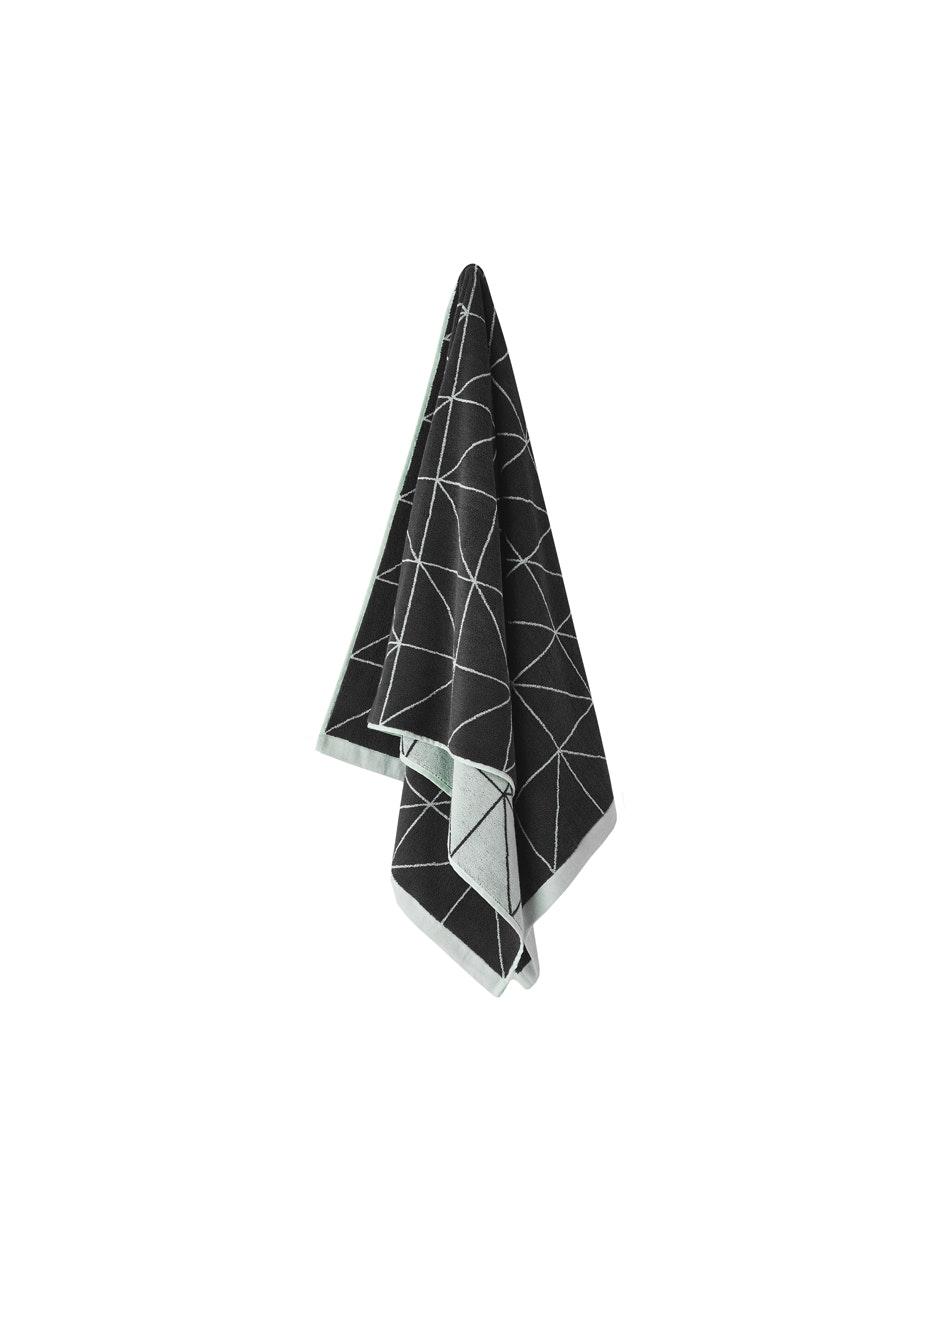 Aura Kami Bath Towel 700 X 1400Mm Charcoal